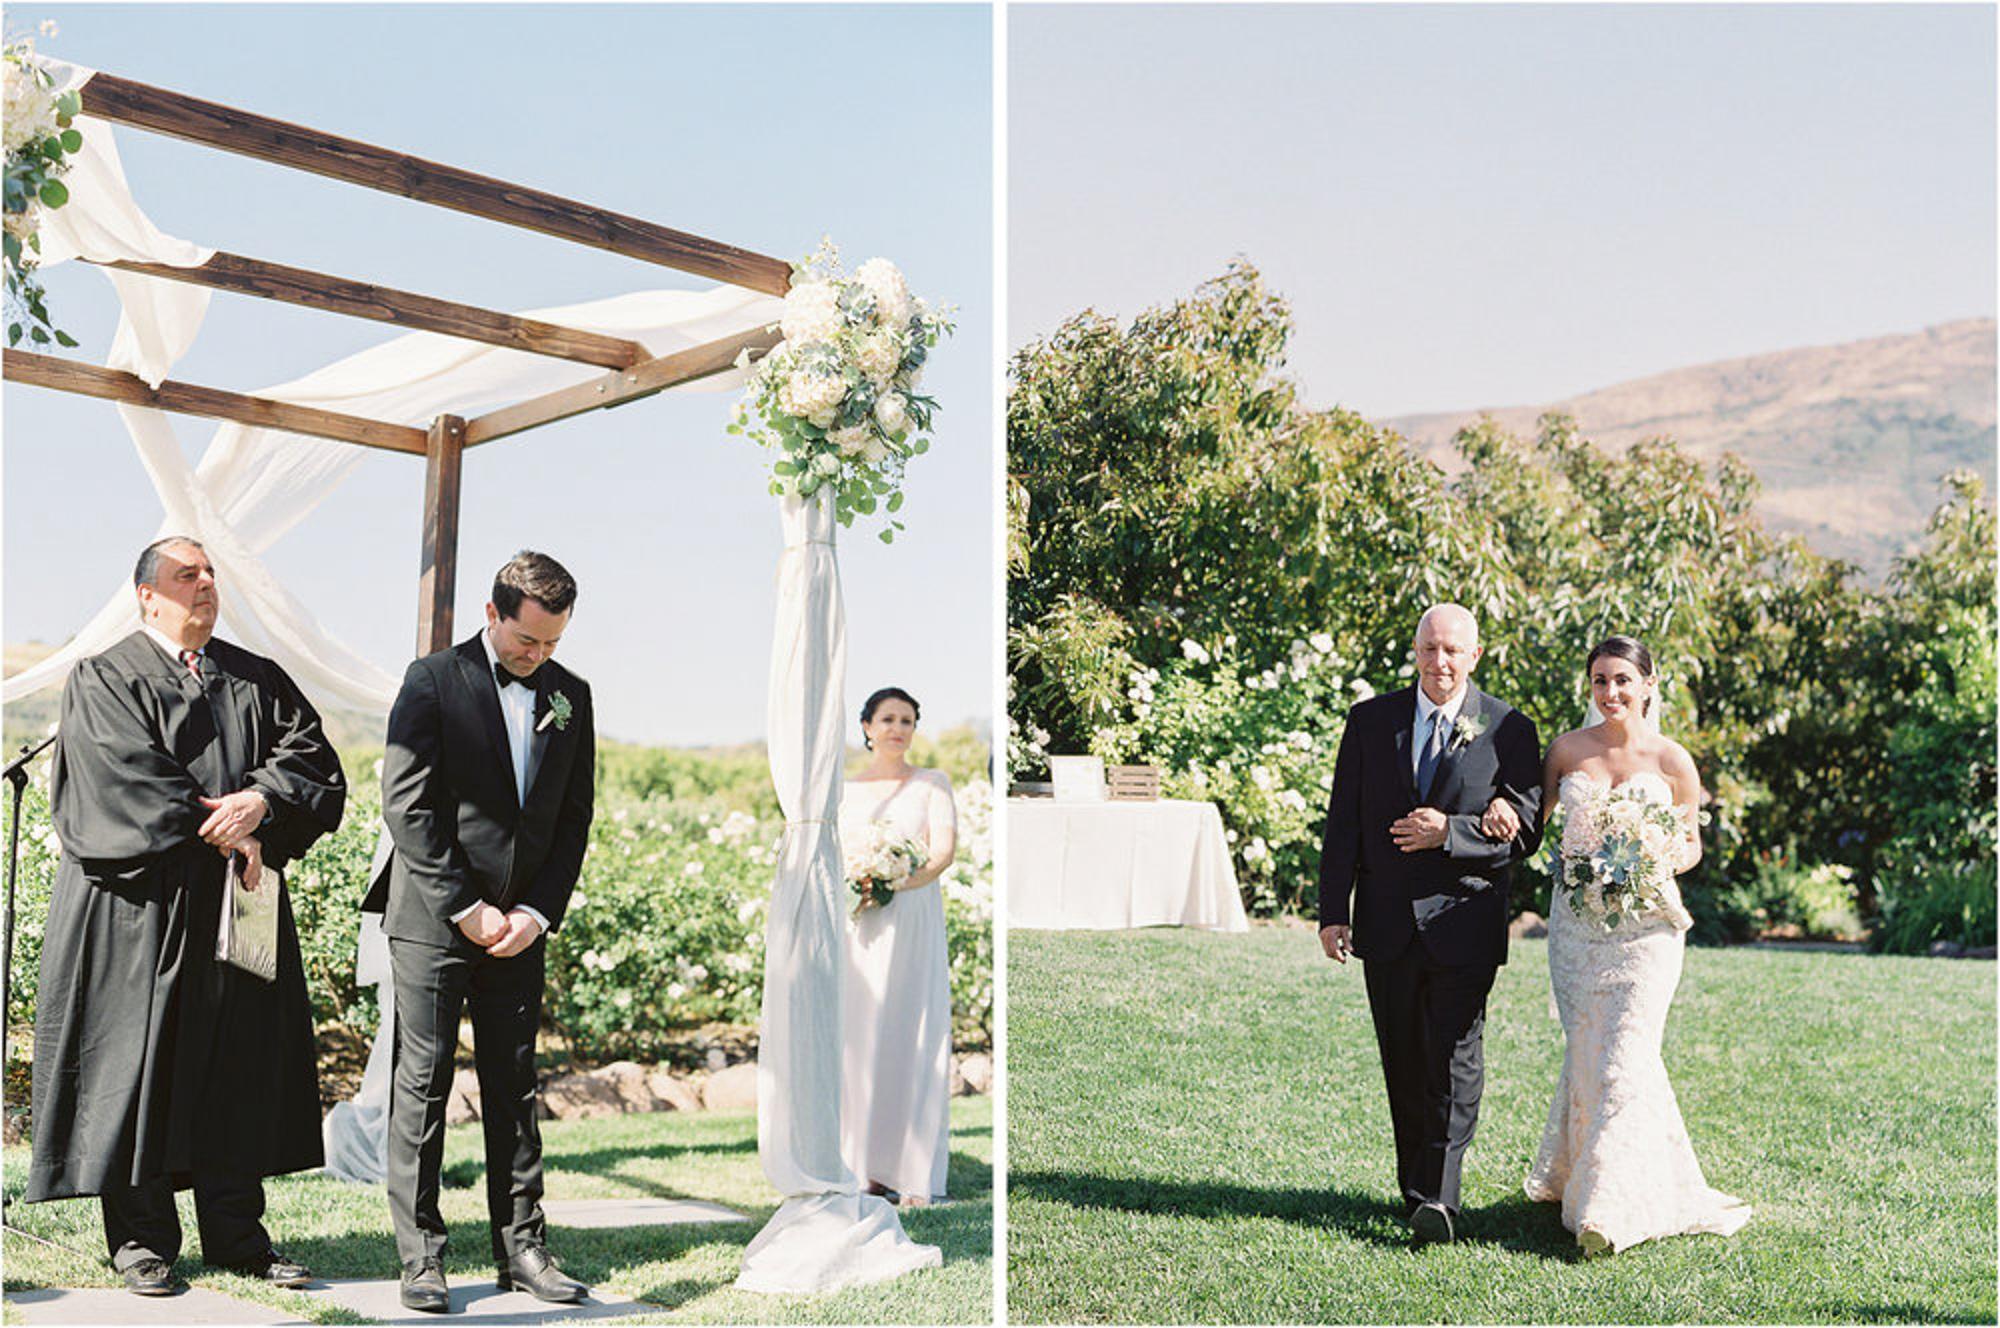 Gerry-Ranch-Wedding-Photography-Kristina-Adams-16.jpg